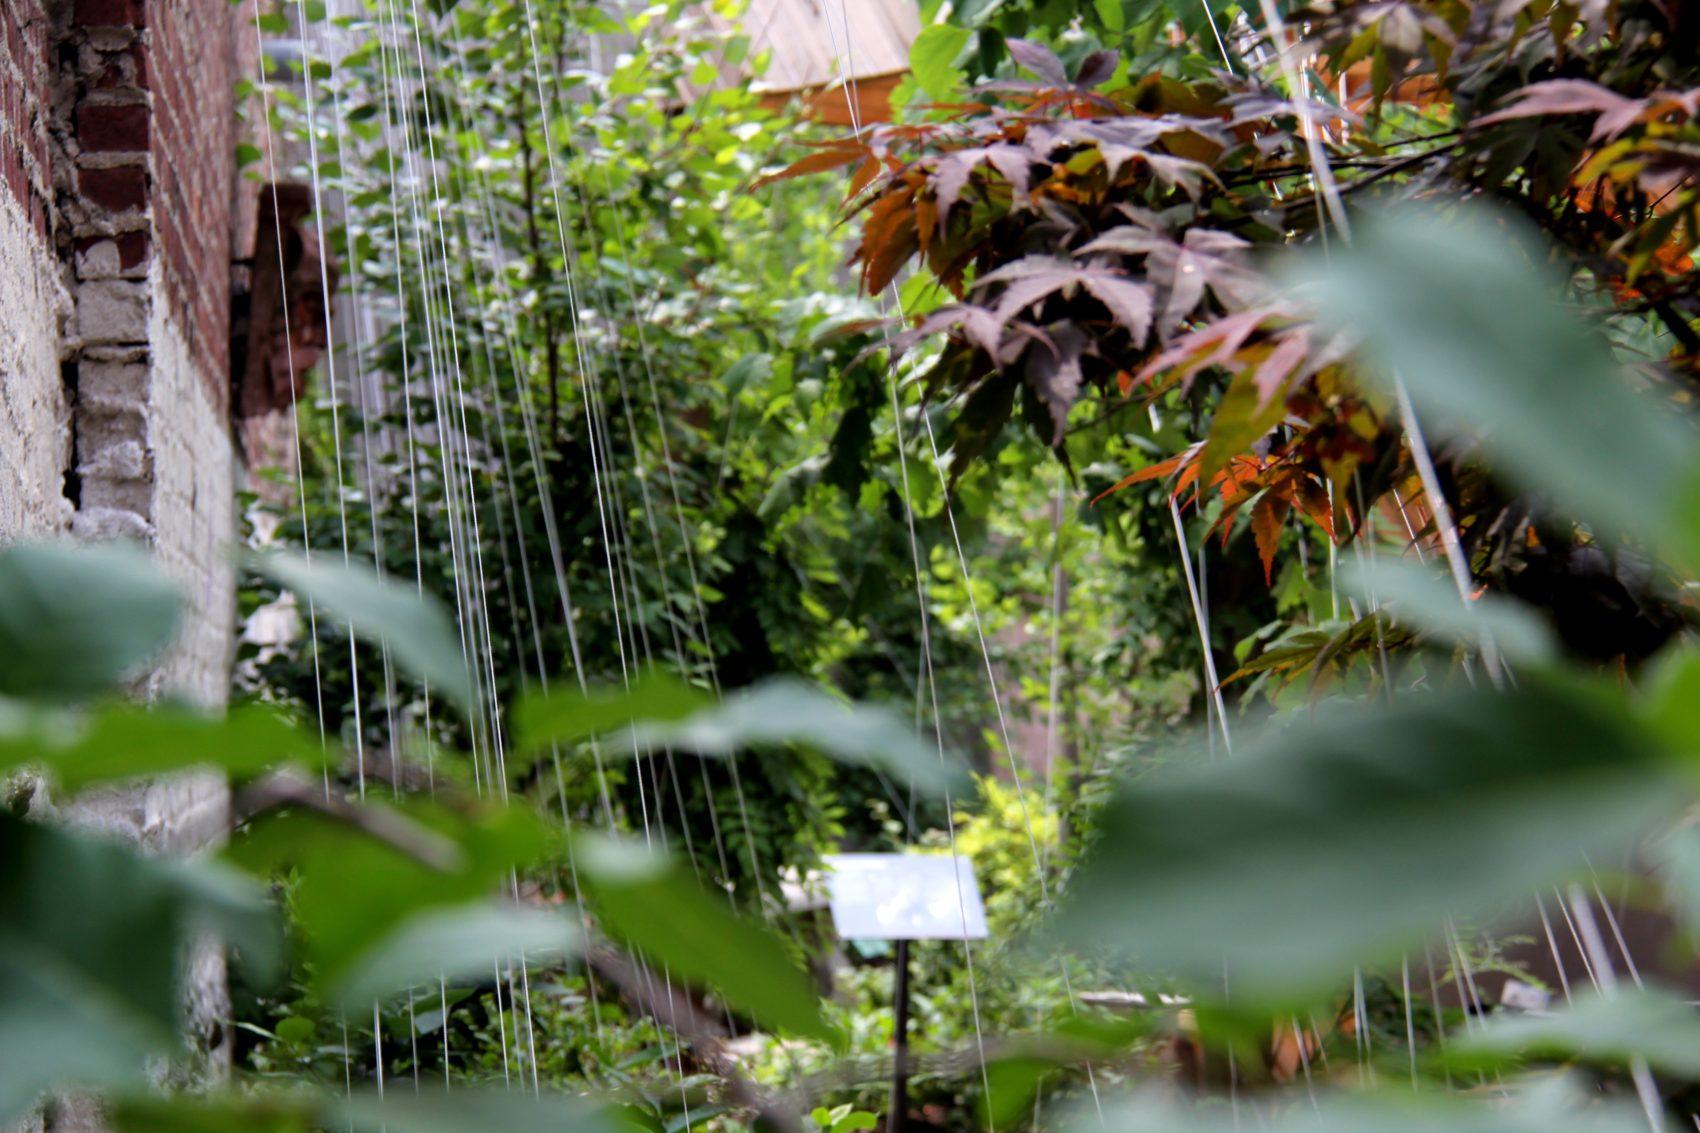 LEIMAY Works Qualia -gardens installation photos July 14th 2014. Photos by Shige Moriya - 07